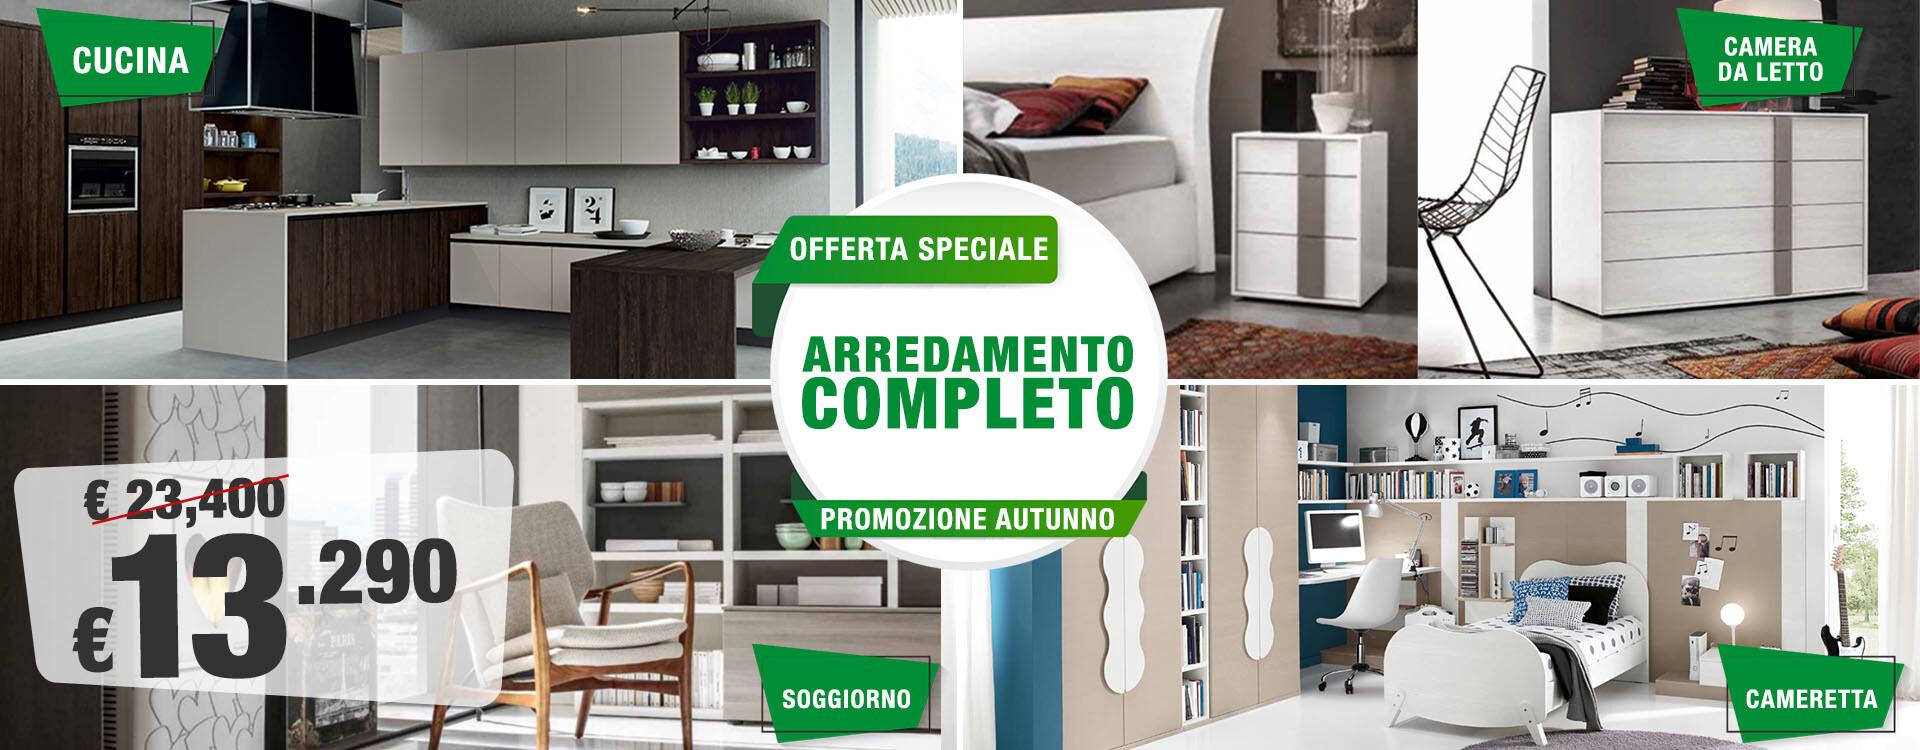 Outlet Arredamento Camerette.Outlet Del Mobile Mia Arredamenti